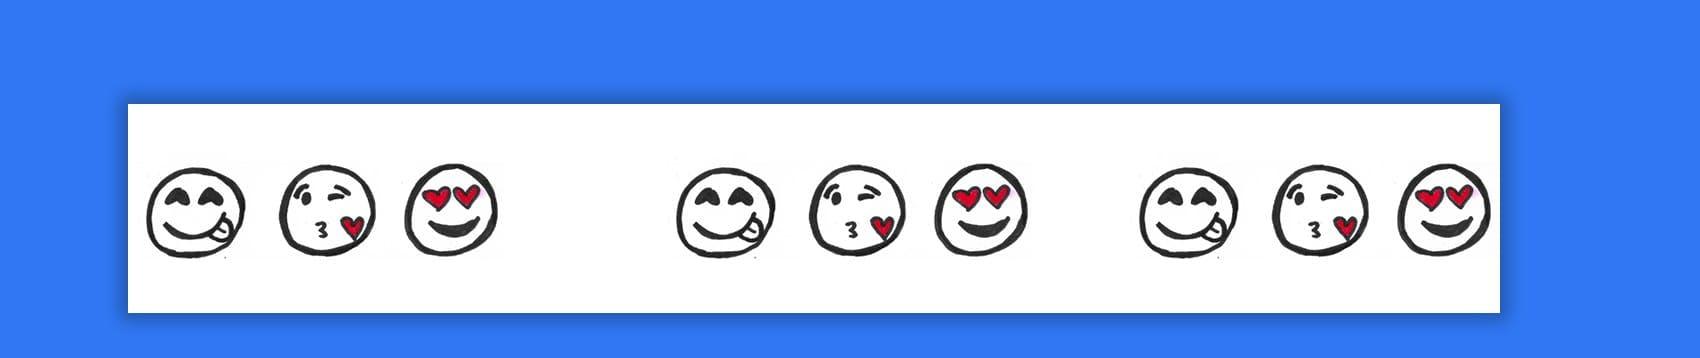 Emoji Etiquette